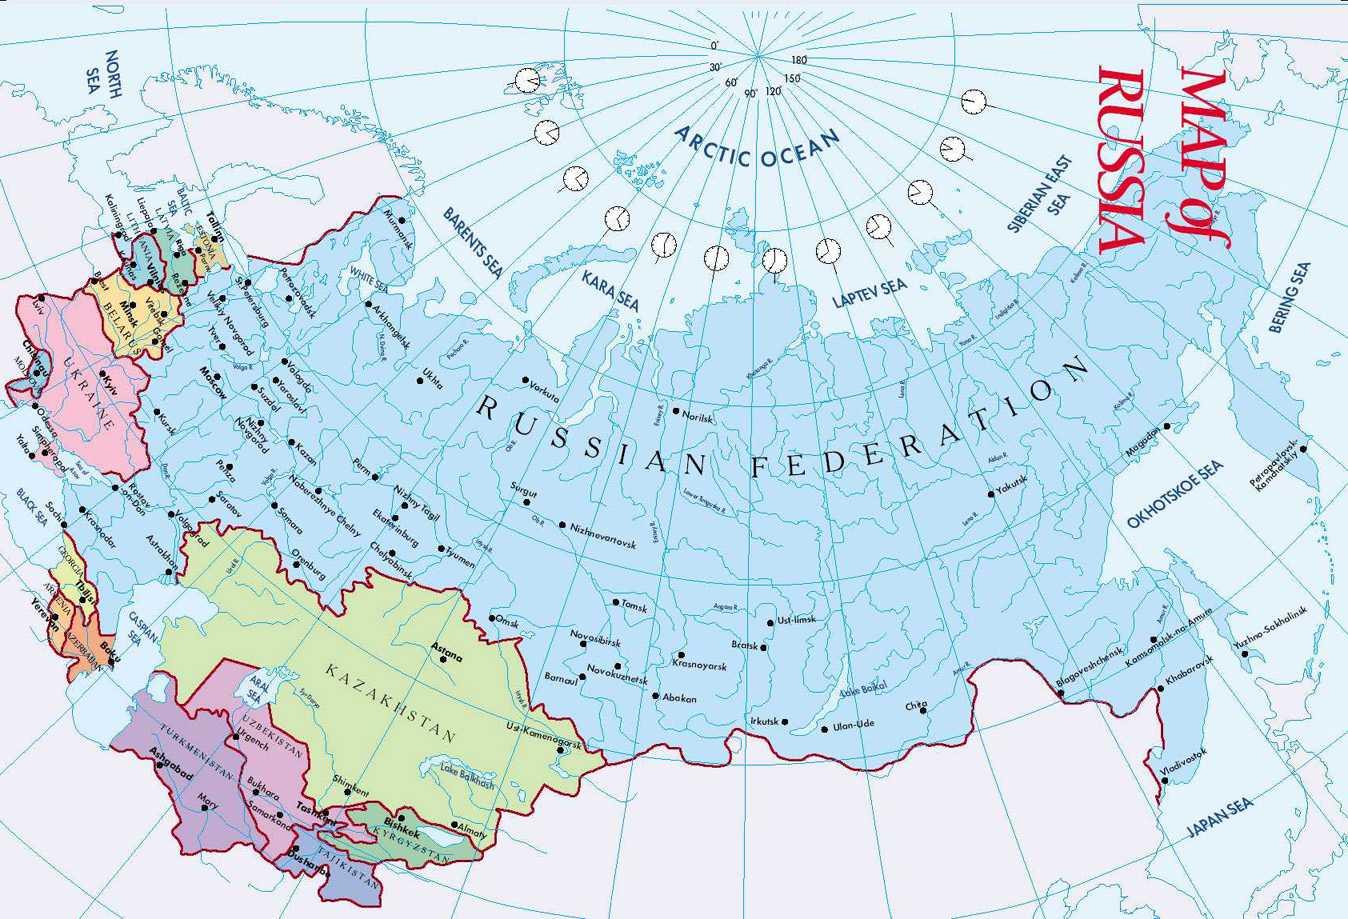 russia-map Ufa Russia Map on markovo russia map, vladivostok map, northeastern russia map, belarus russia map, russian provinces map, nizhny novgorod, yekaterinburg russia map, tbilisi russia map, kazan russia map, volgograd russia map, sevastopol russia map, tatarstan map, bashkortostan russia map, yurga russia map, yuzhno russia map, mountain range in europe and russia map, elista russia map, voronezh russia map, saint petersburg, landau russia map, serpukhov russia map,